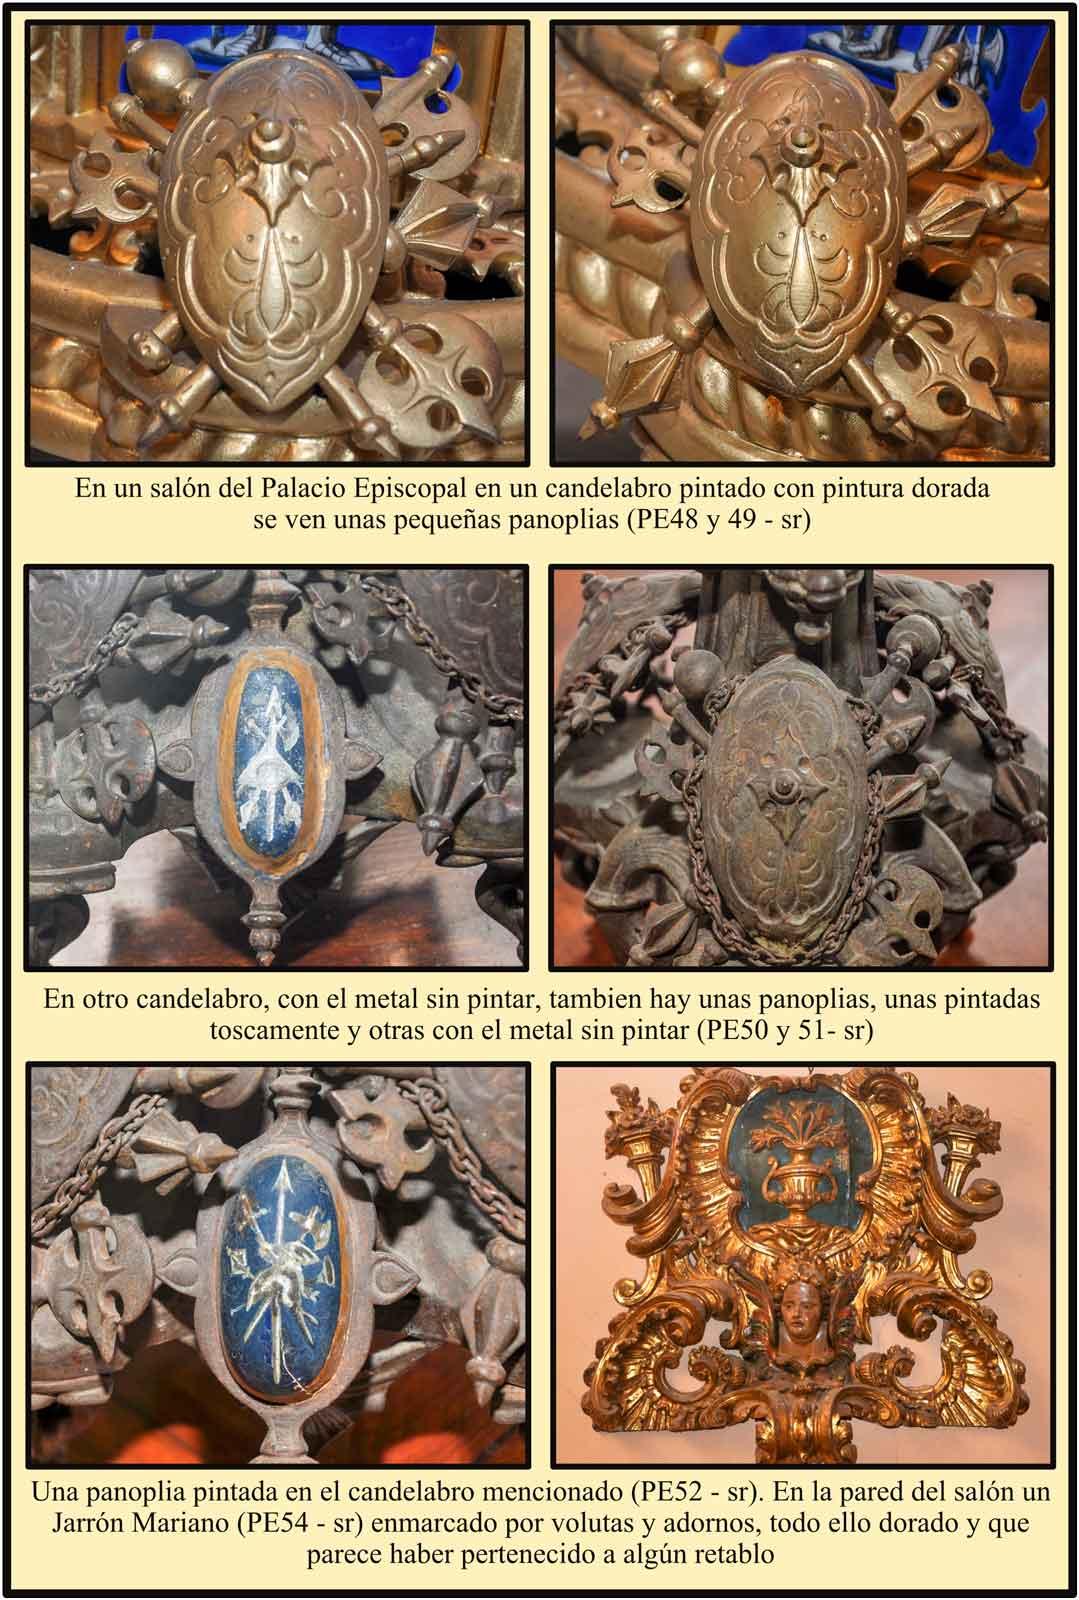 Plasencia Palacio Episcopal Candelabros panoplia jarron mariano salon